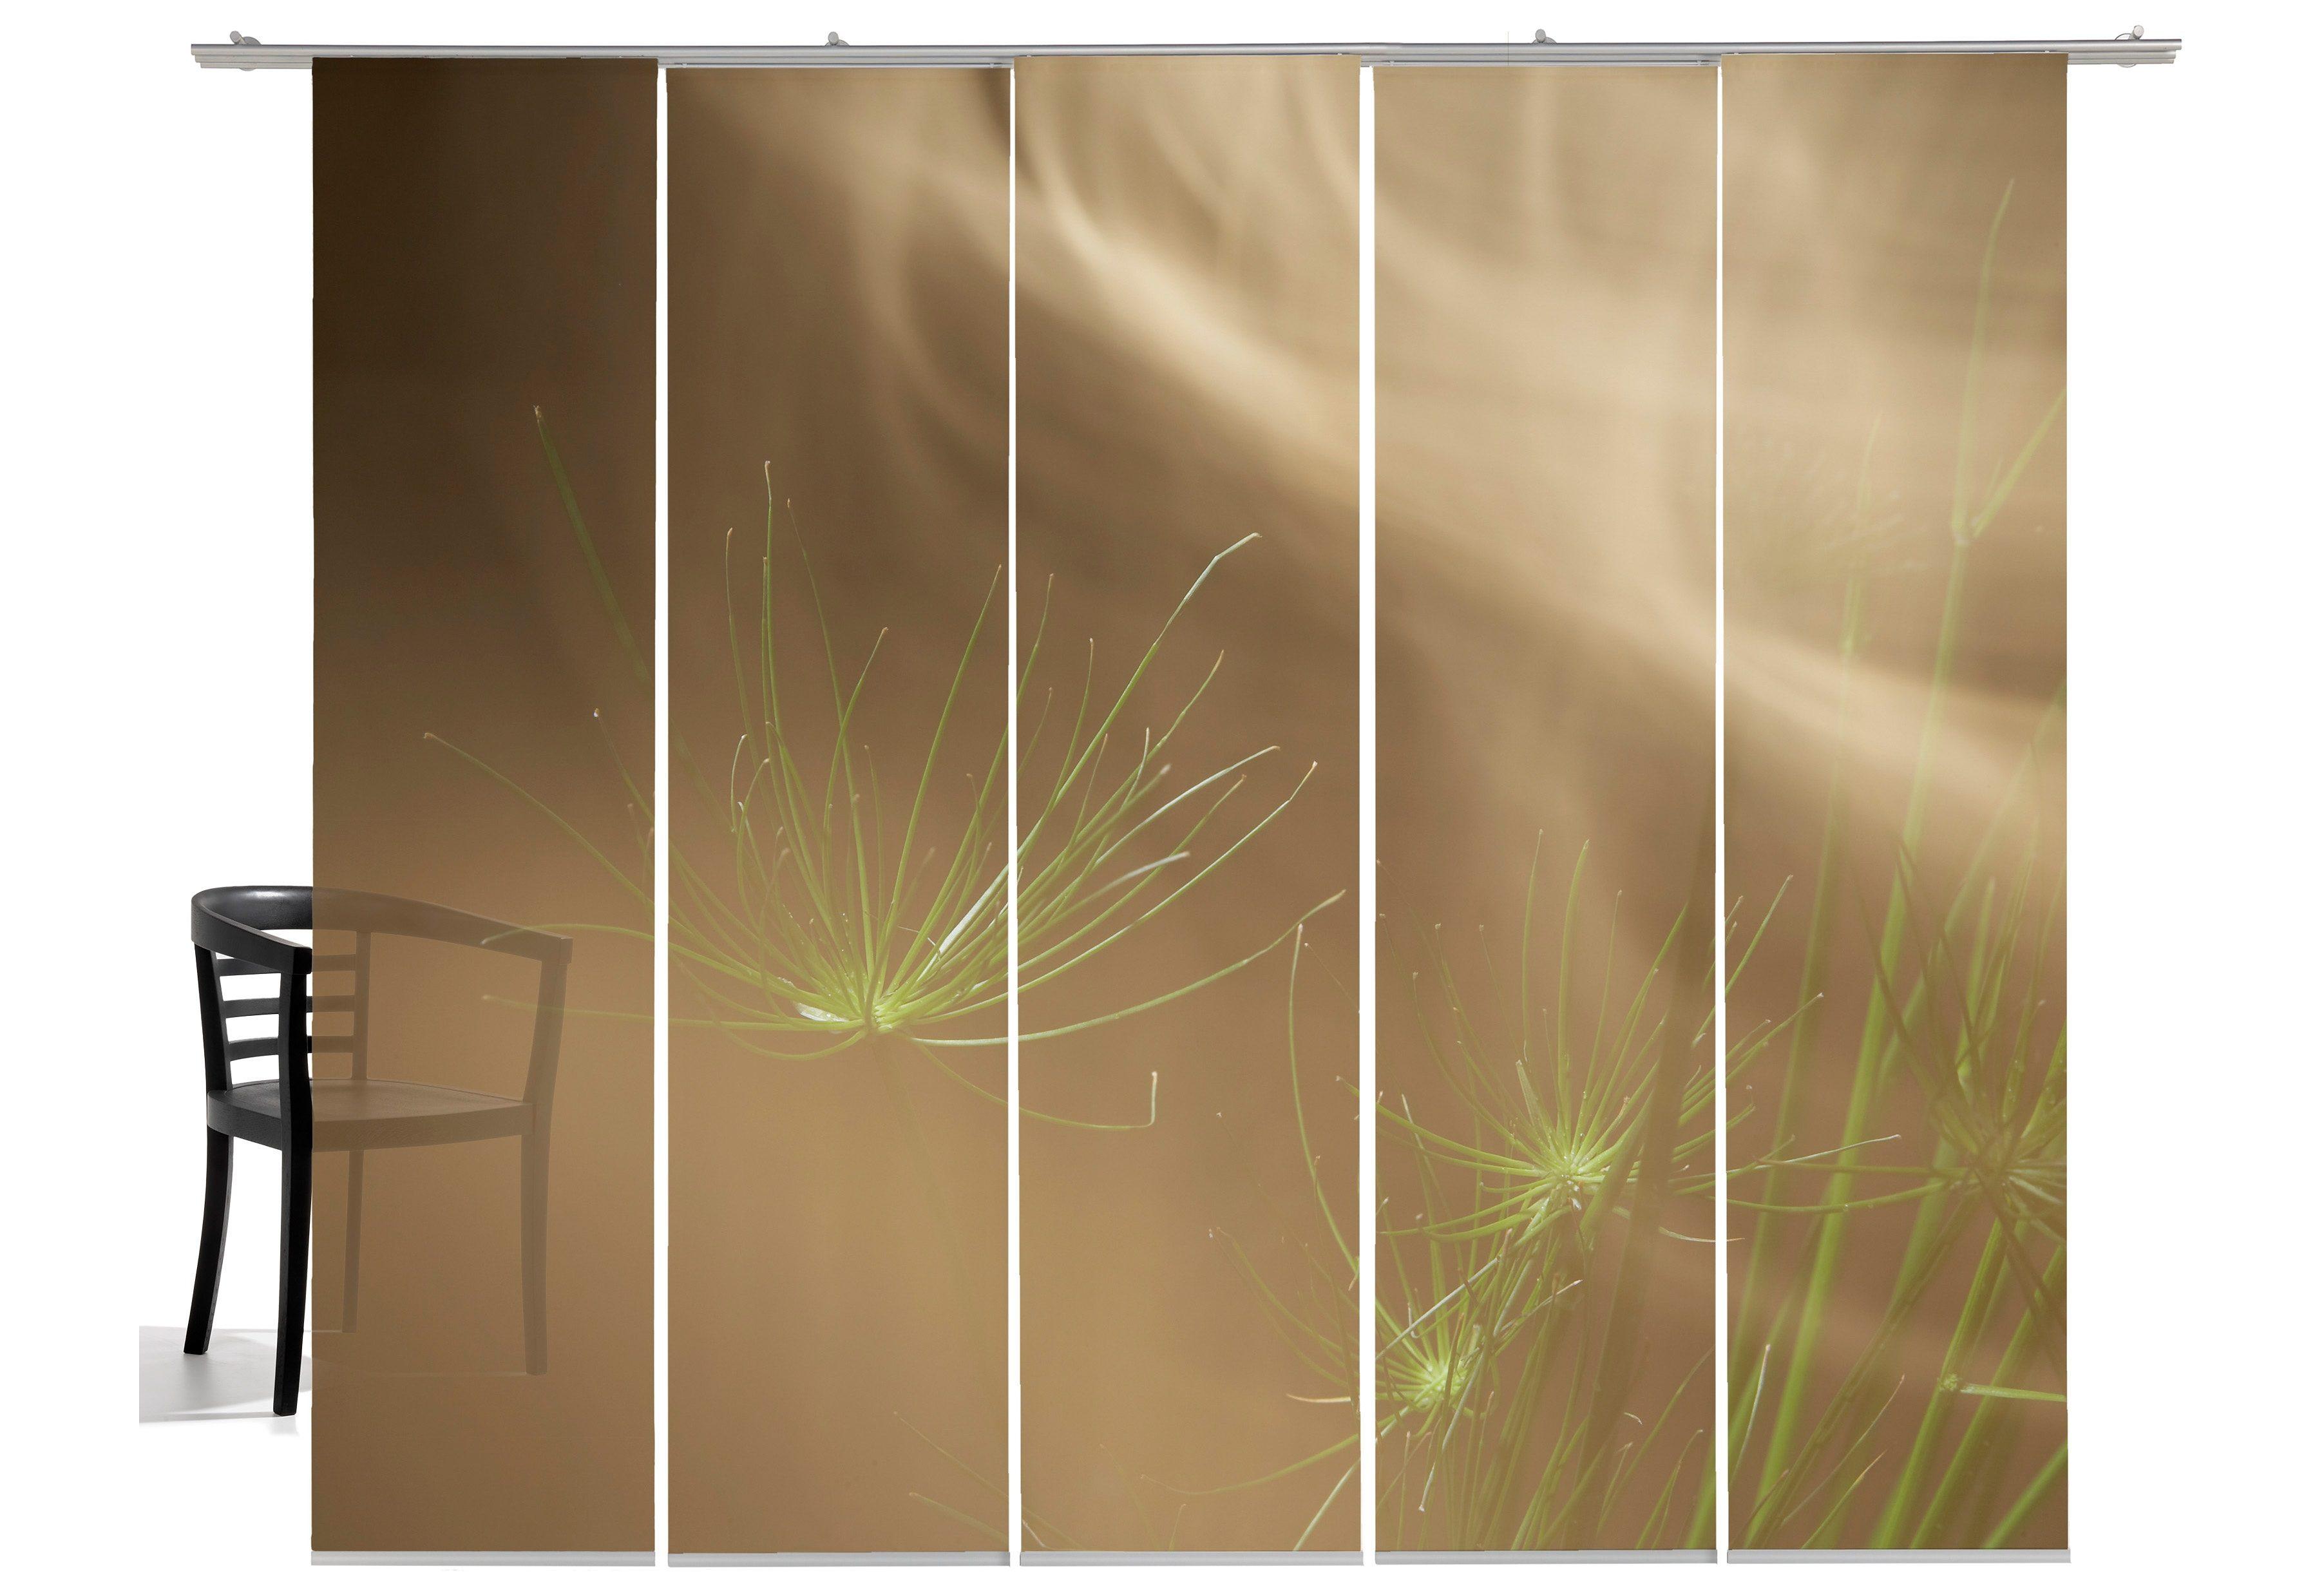 Schiebegardine »Grasnebel«, emotion textiles, Klettband (5 Stück), inkl. Beschwerungsstange